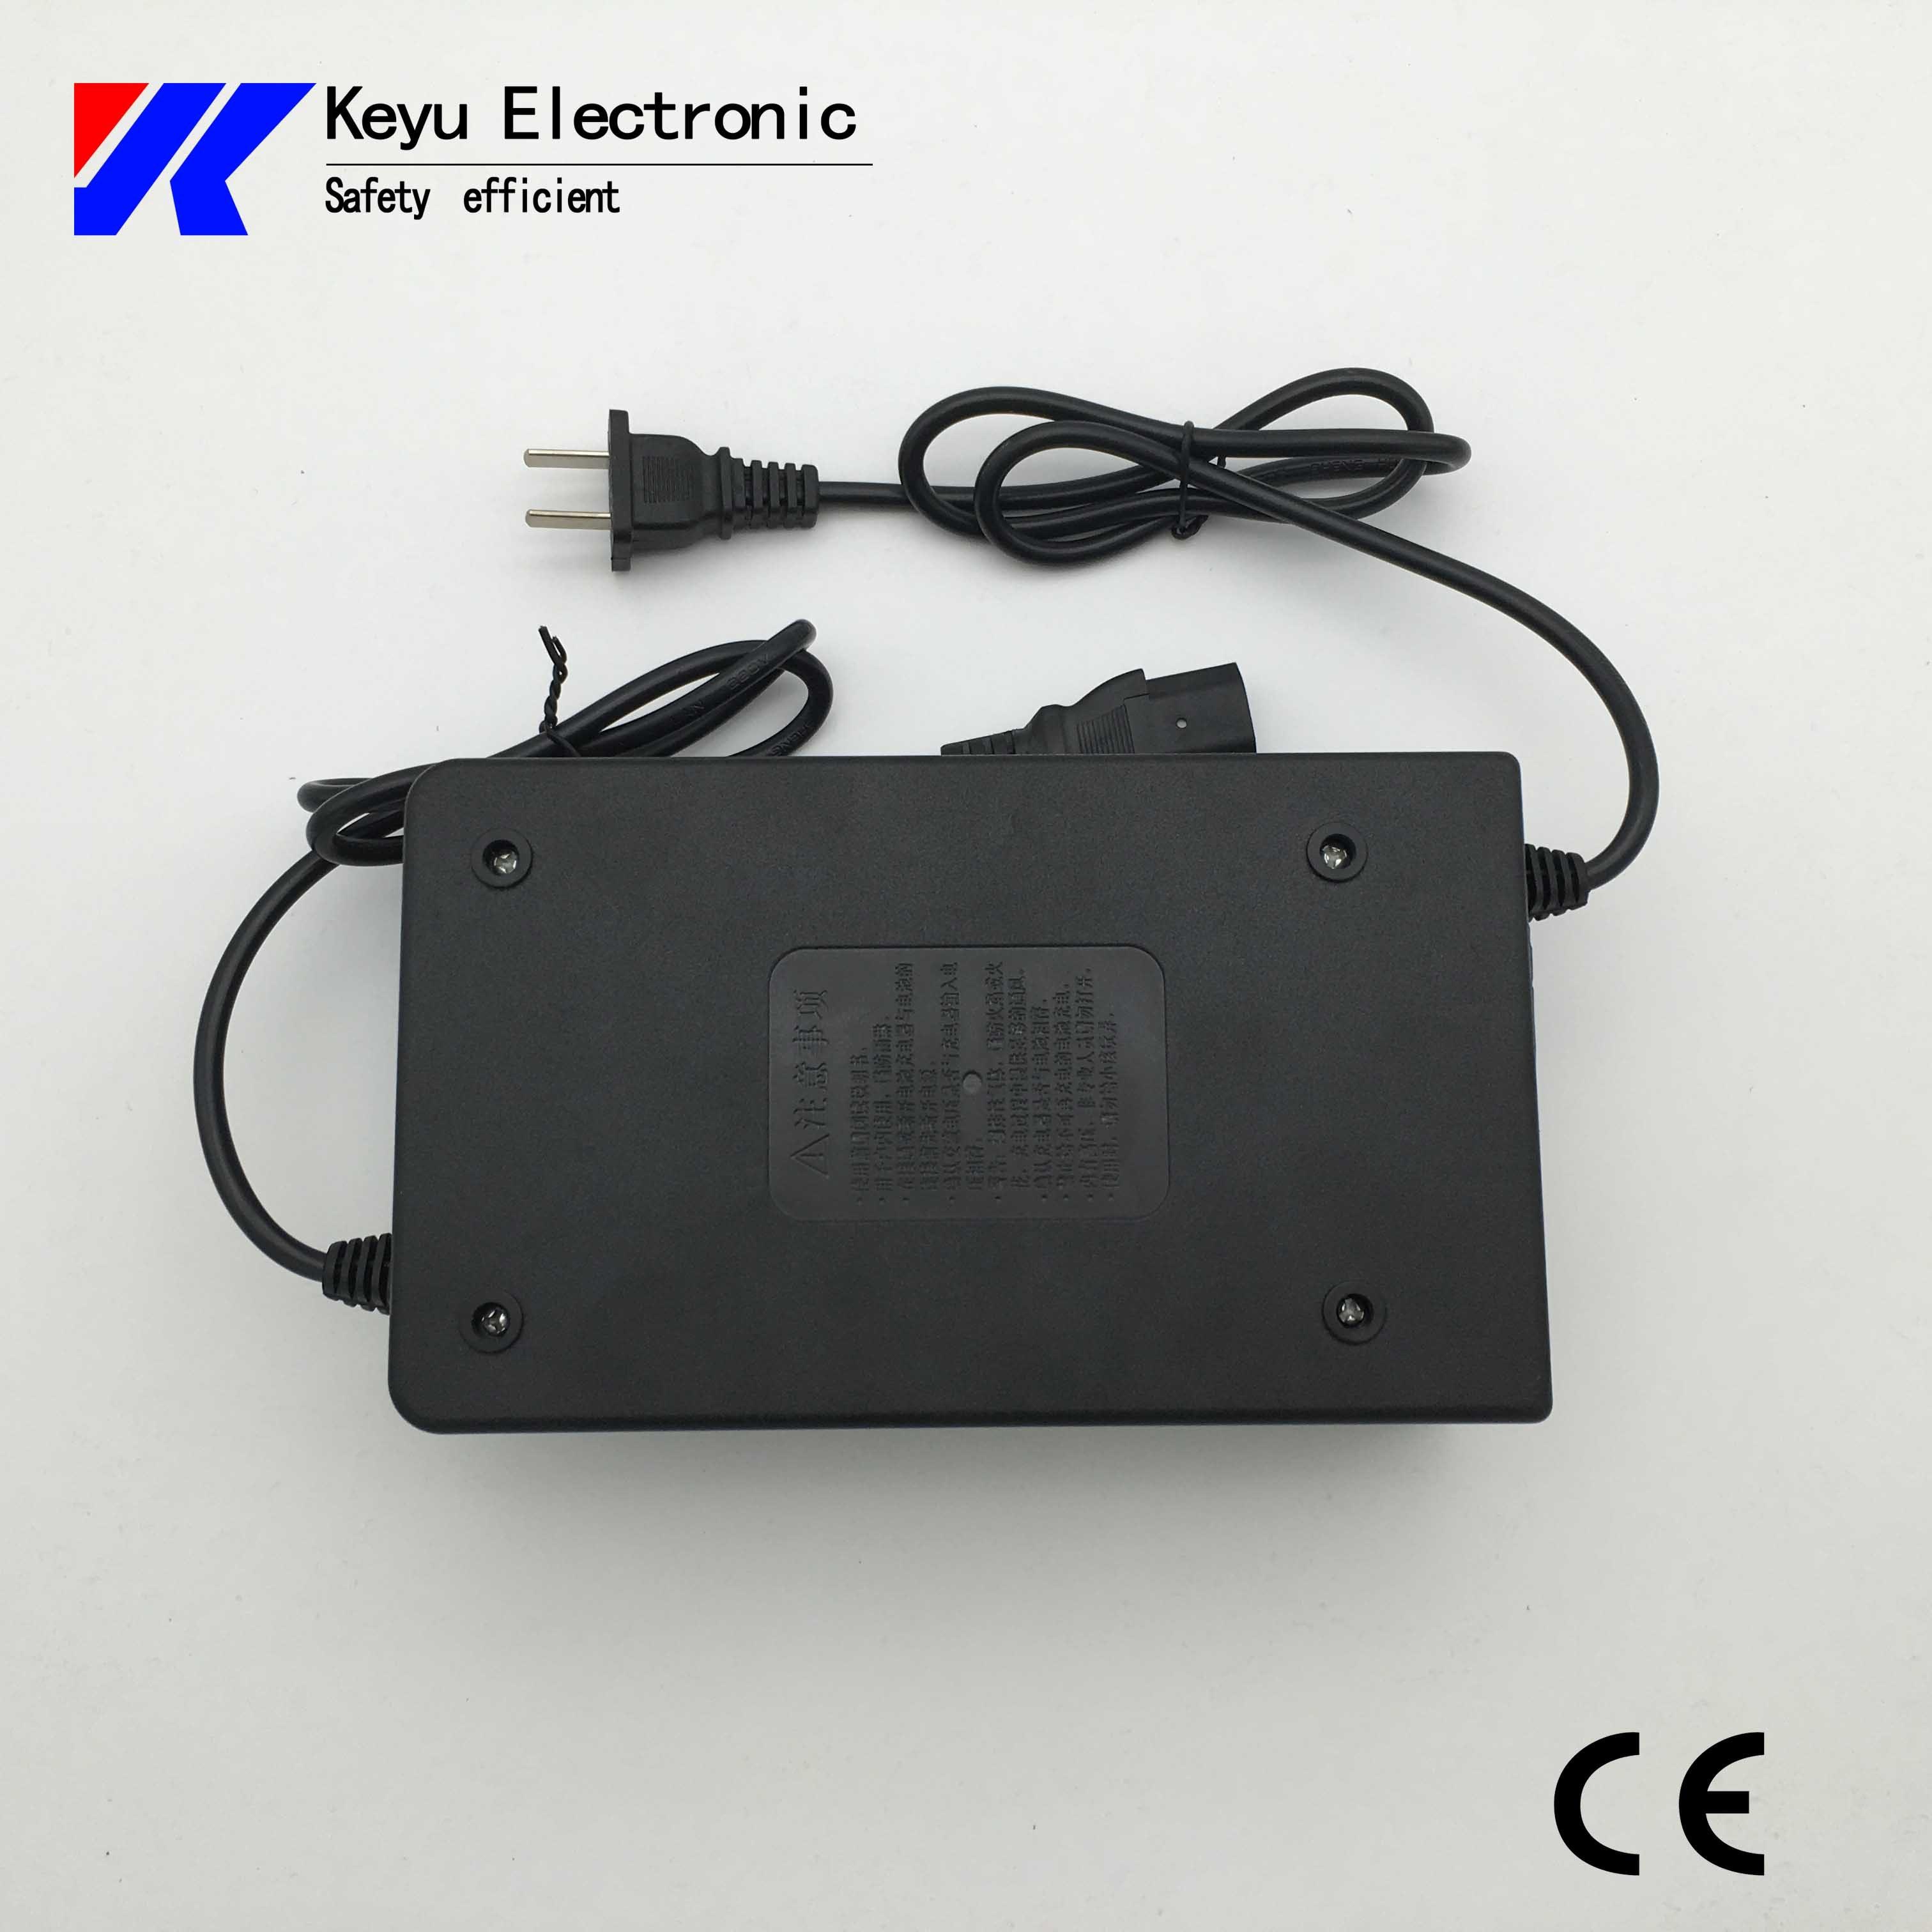 Ke Yu Ebike Charger (Lead Acid battery) 48V-30ah